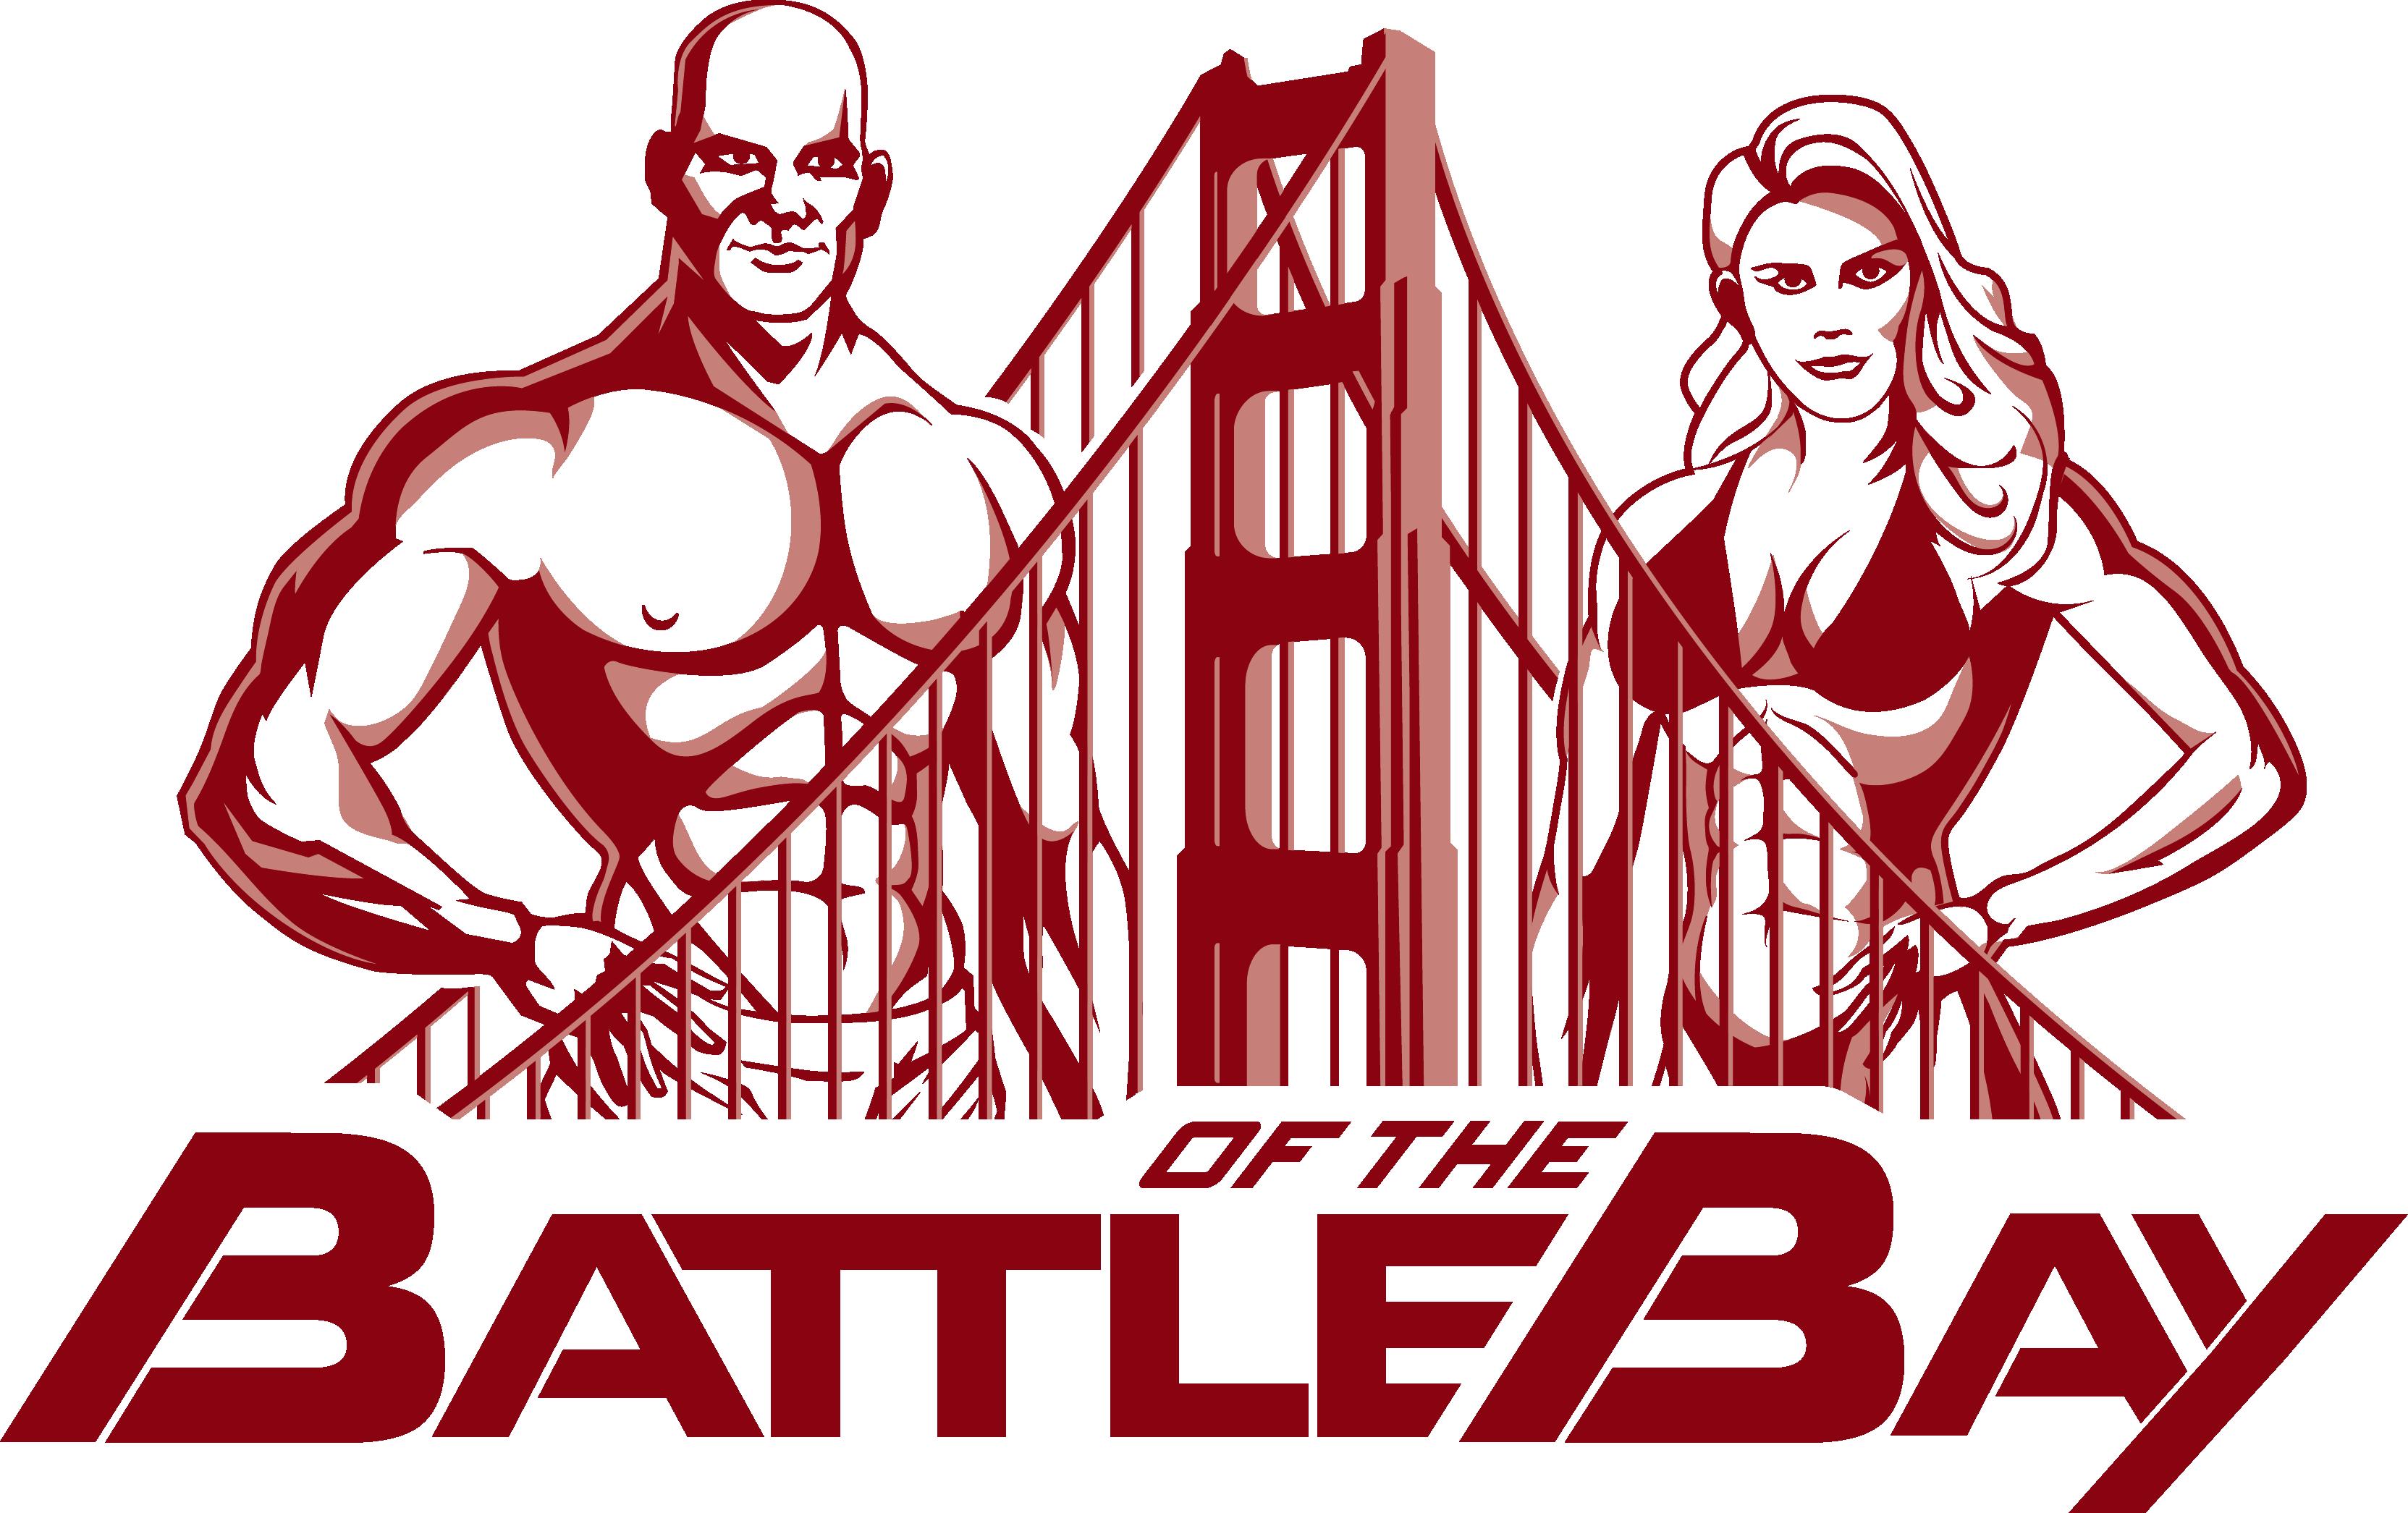 2017 INBF Battle of the Bay WNBF Pro Qualifier San Ramon California